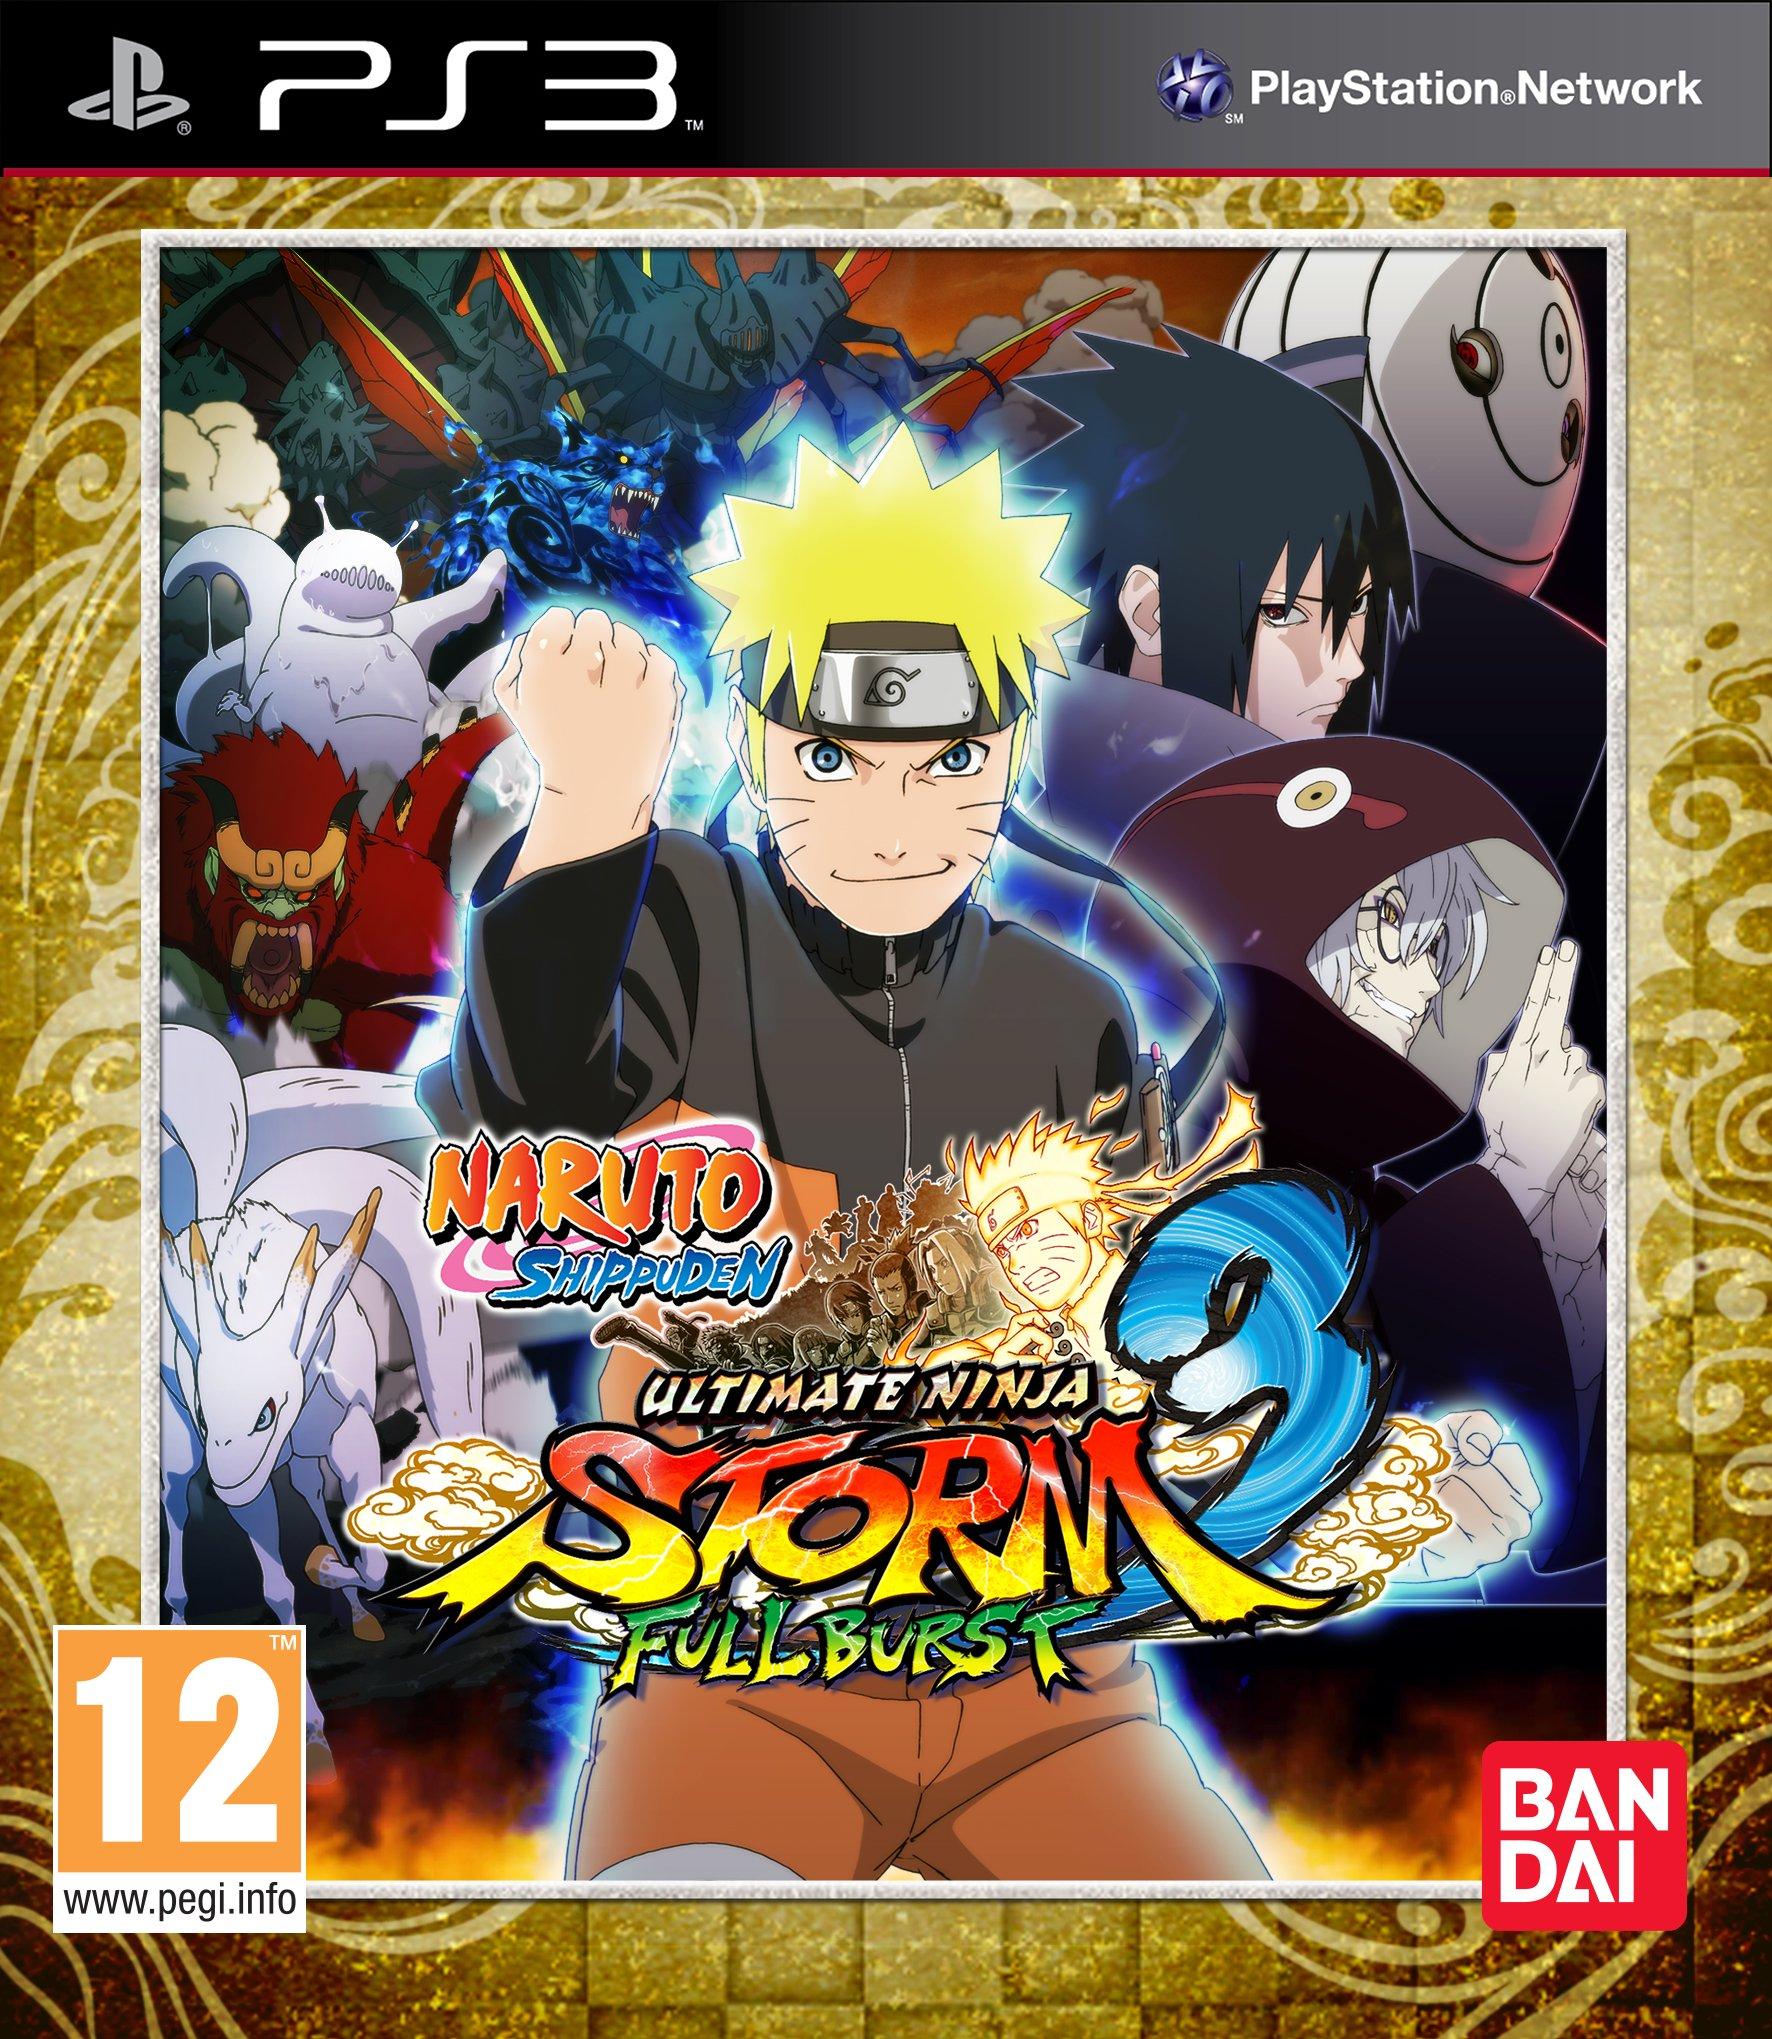 NarutoShippuden-UltimateNinjaStorm3FullBurst PS3 Jaquette 001